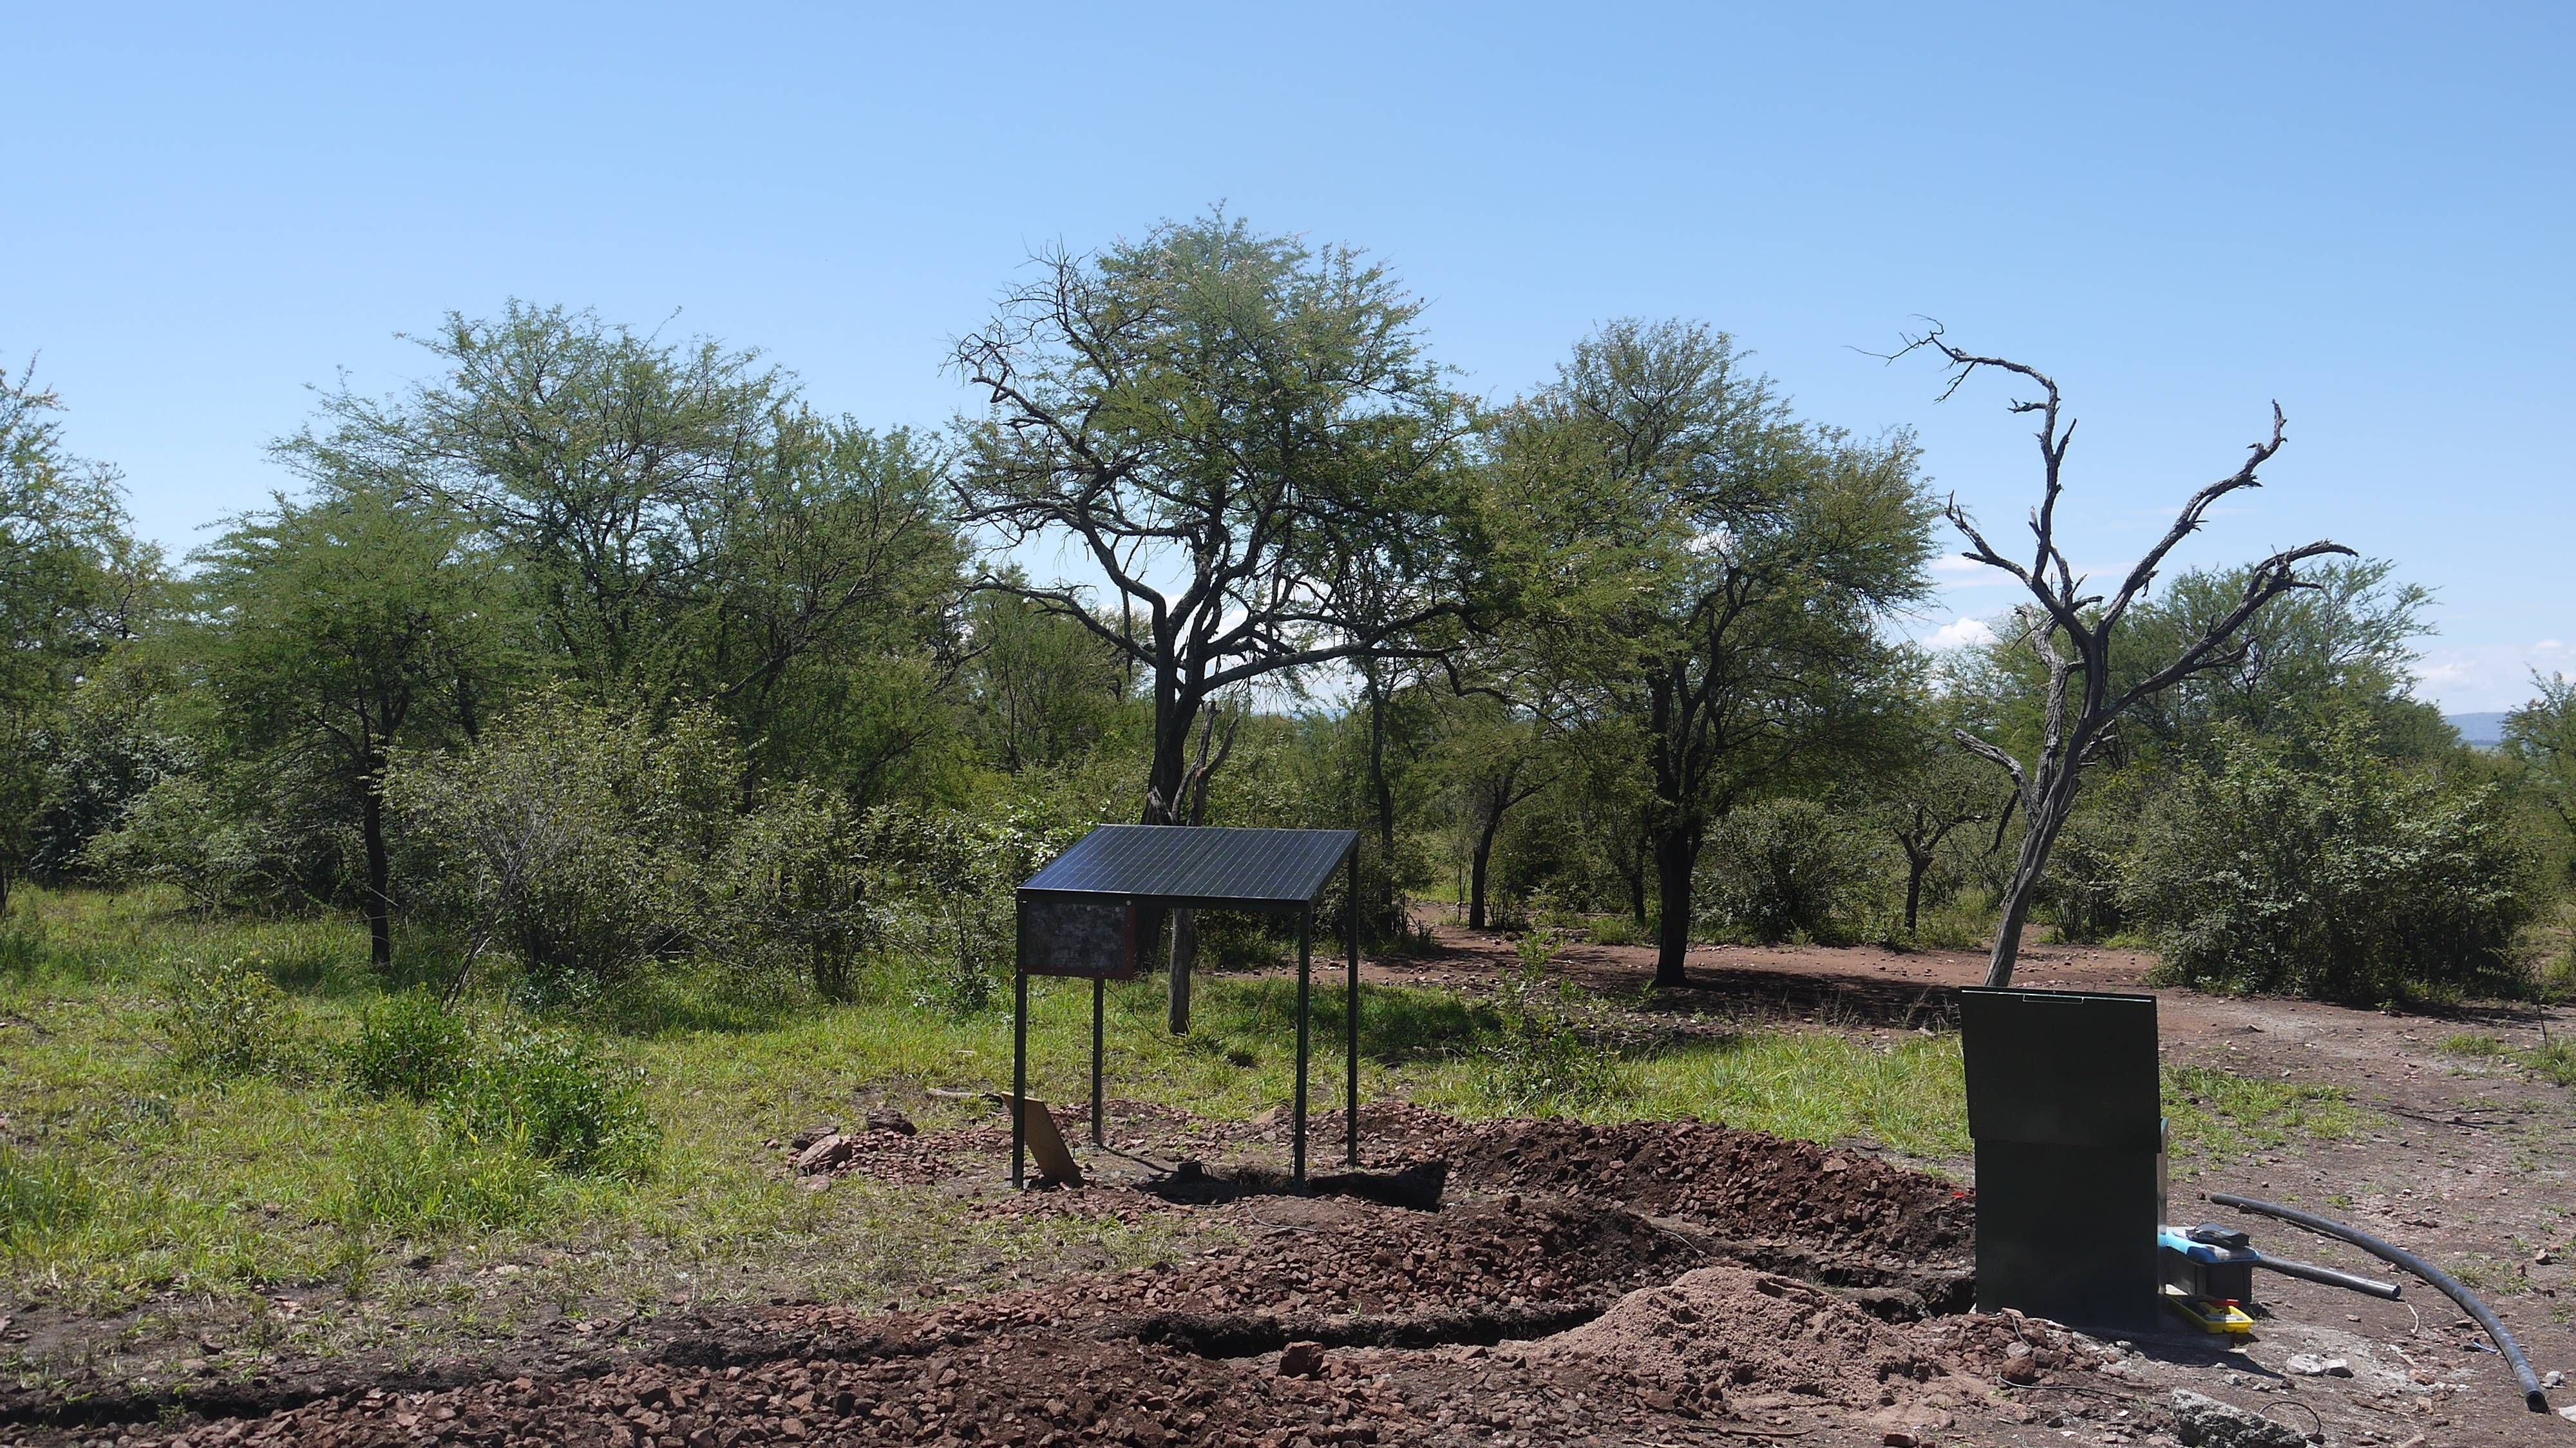 Rhino Sanctuary, Tanzania, February 2017